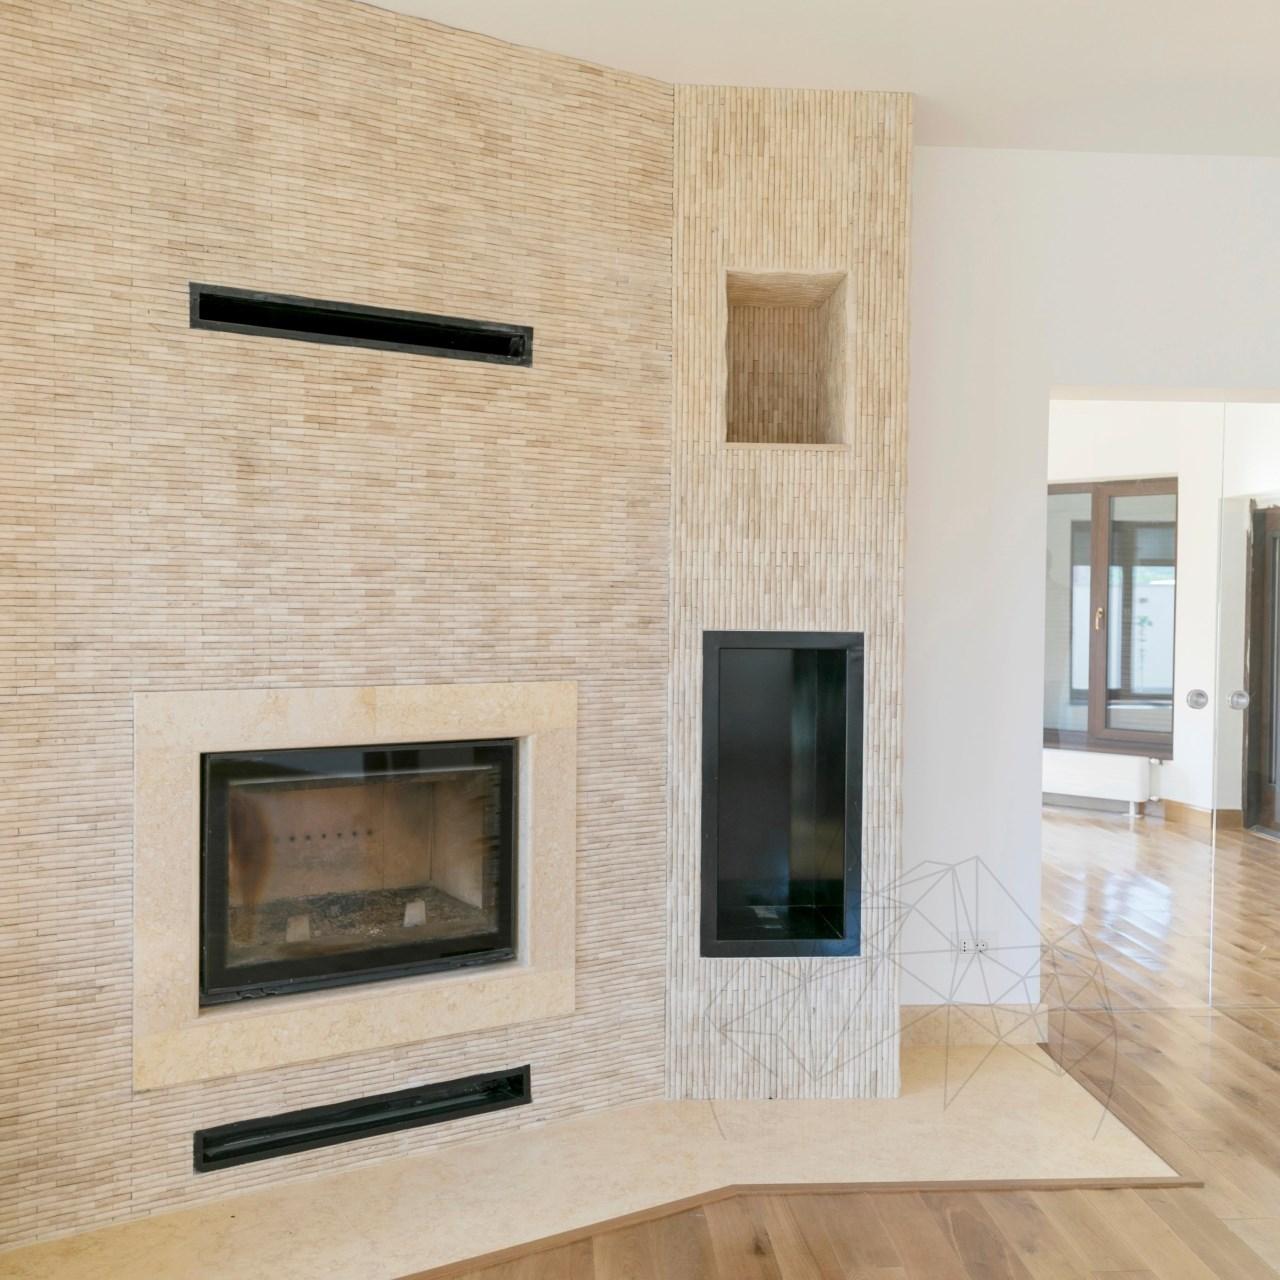 Classic Travertine Tumbled Bamboo Mosaic 1.5 x 7.5 cm title=Classic Travertine Tumbled Bamboo Mosaic 1.5 x 7.5 cm